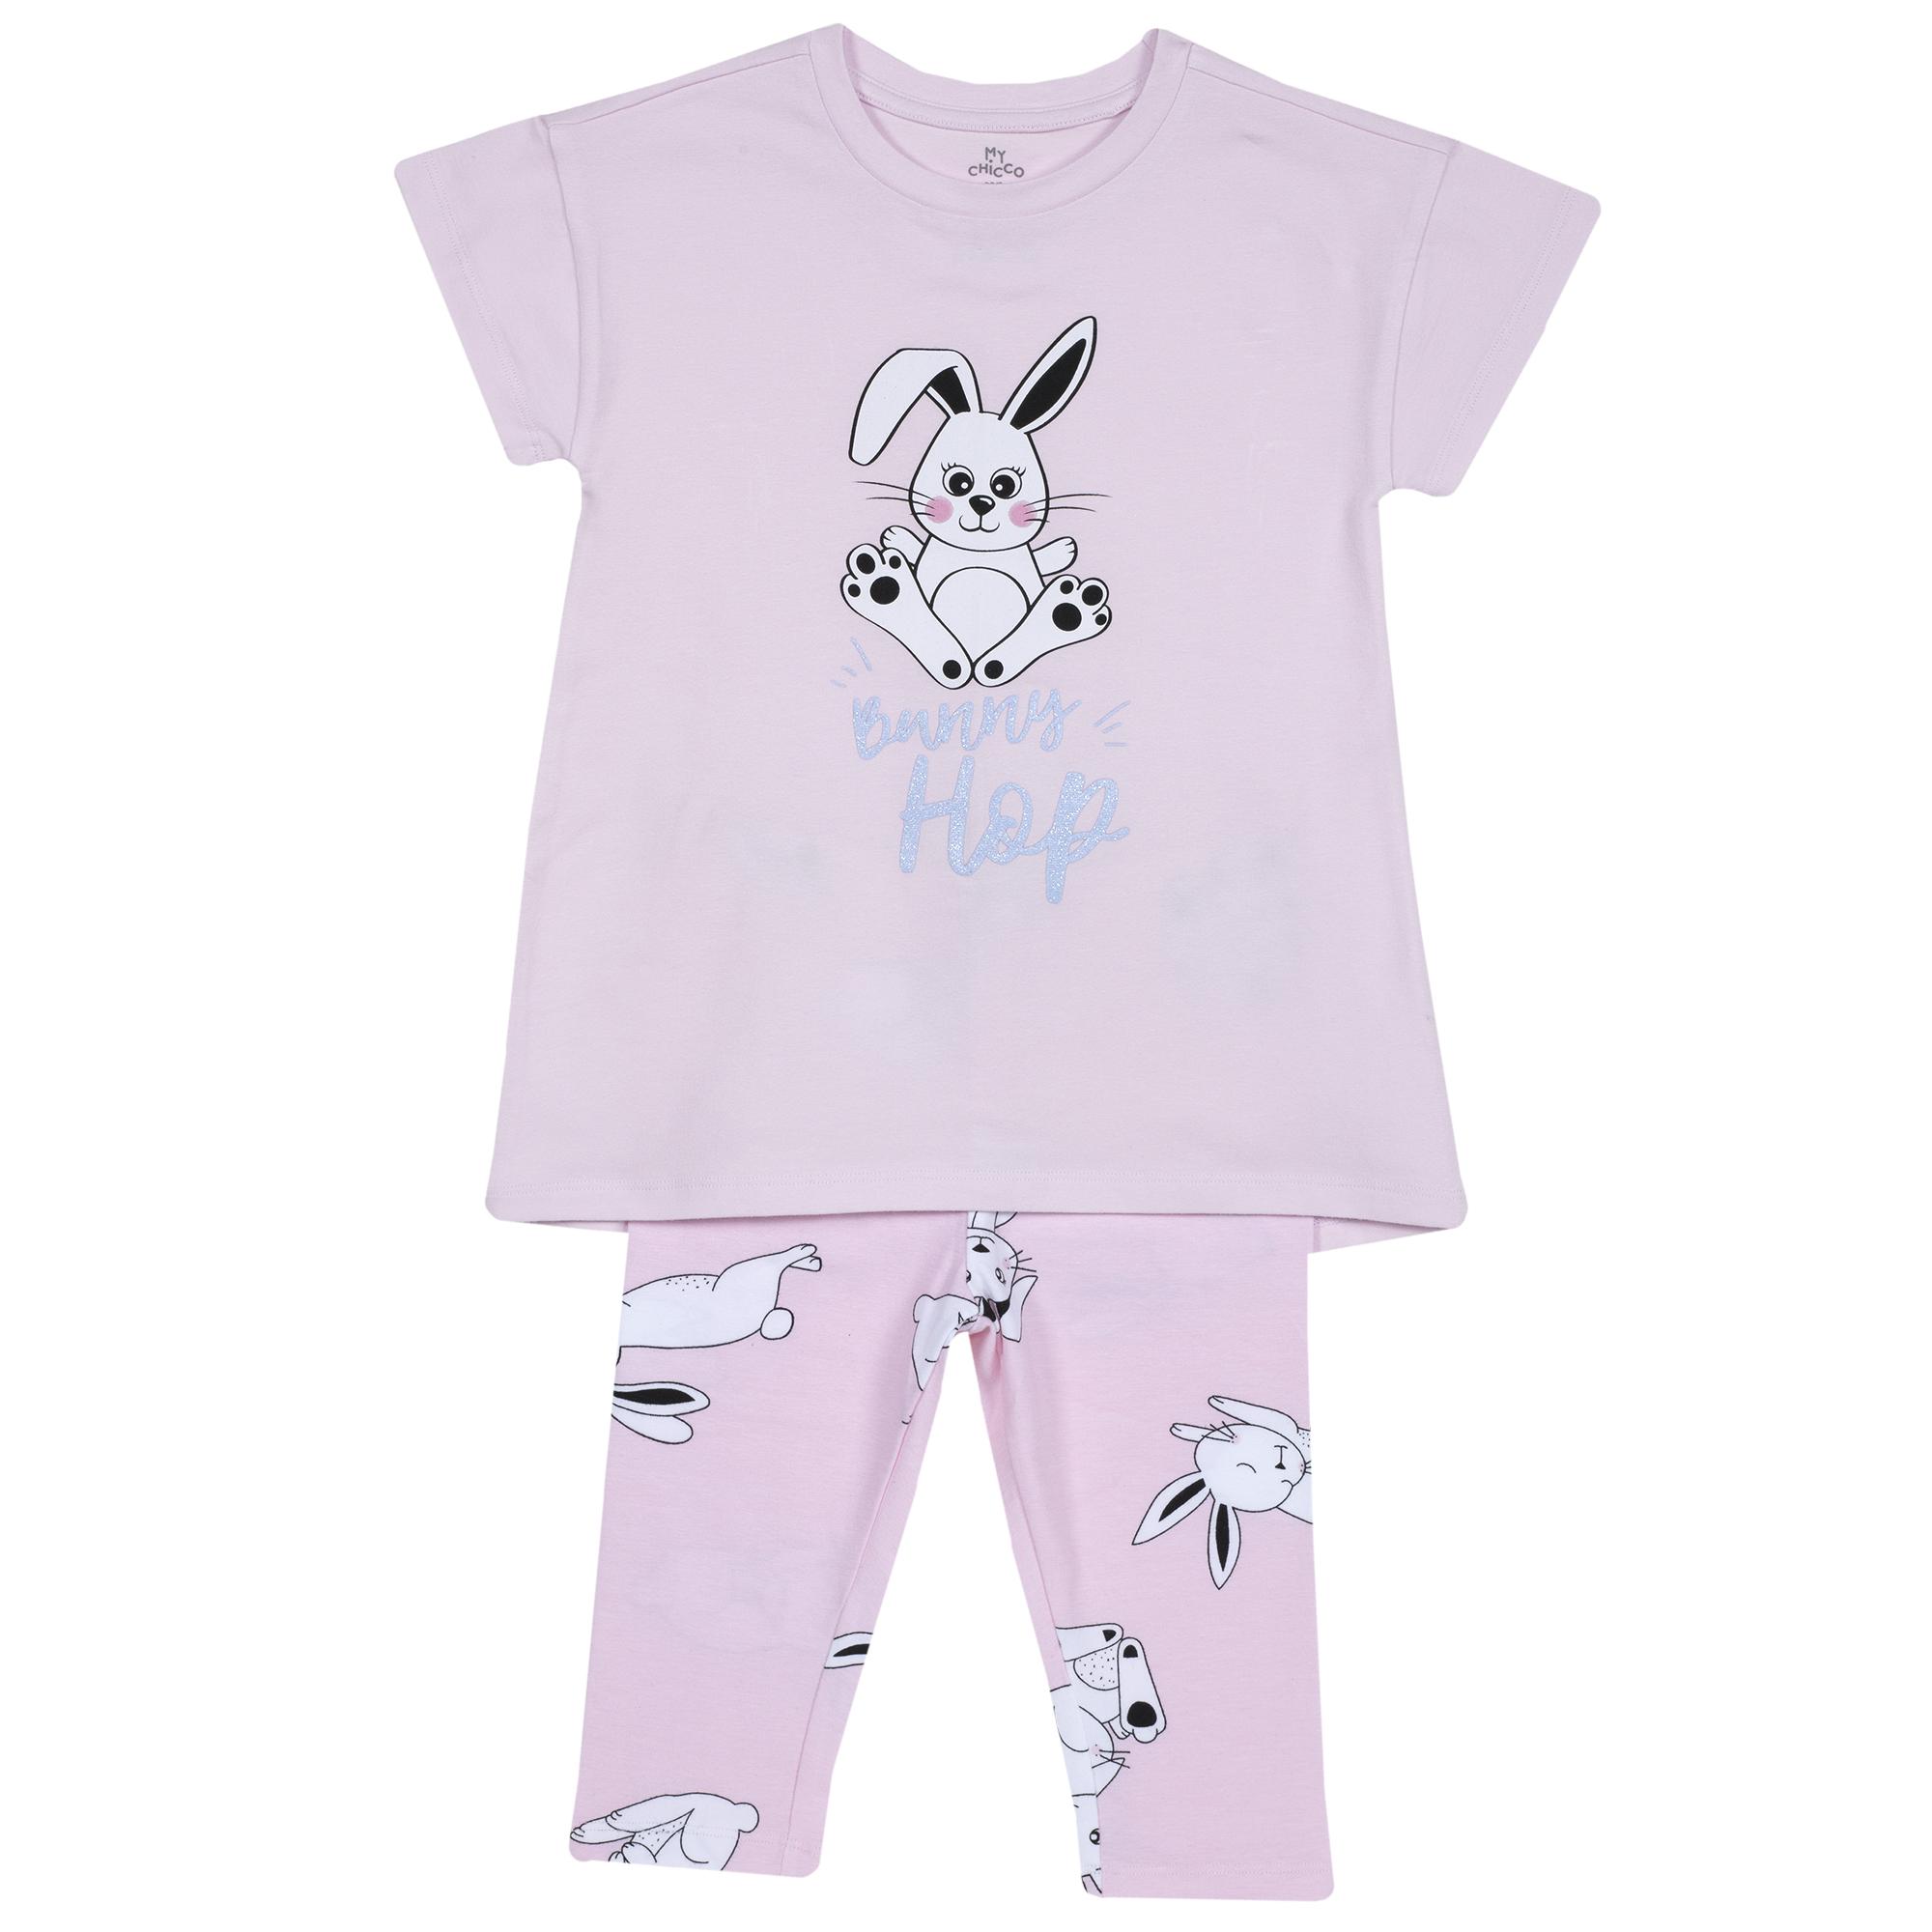 Pijama Copii Chicco, Tricou Si Pantalon, Roz Cu Model, 35358 imagine